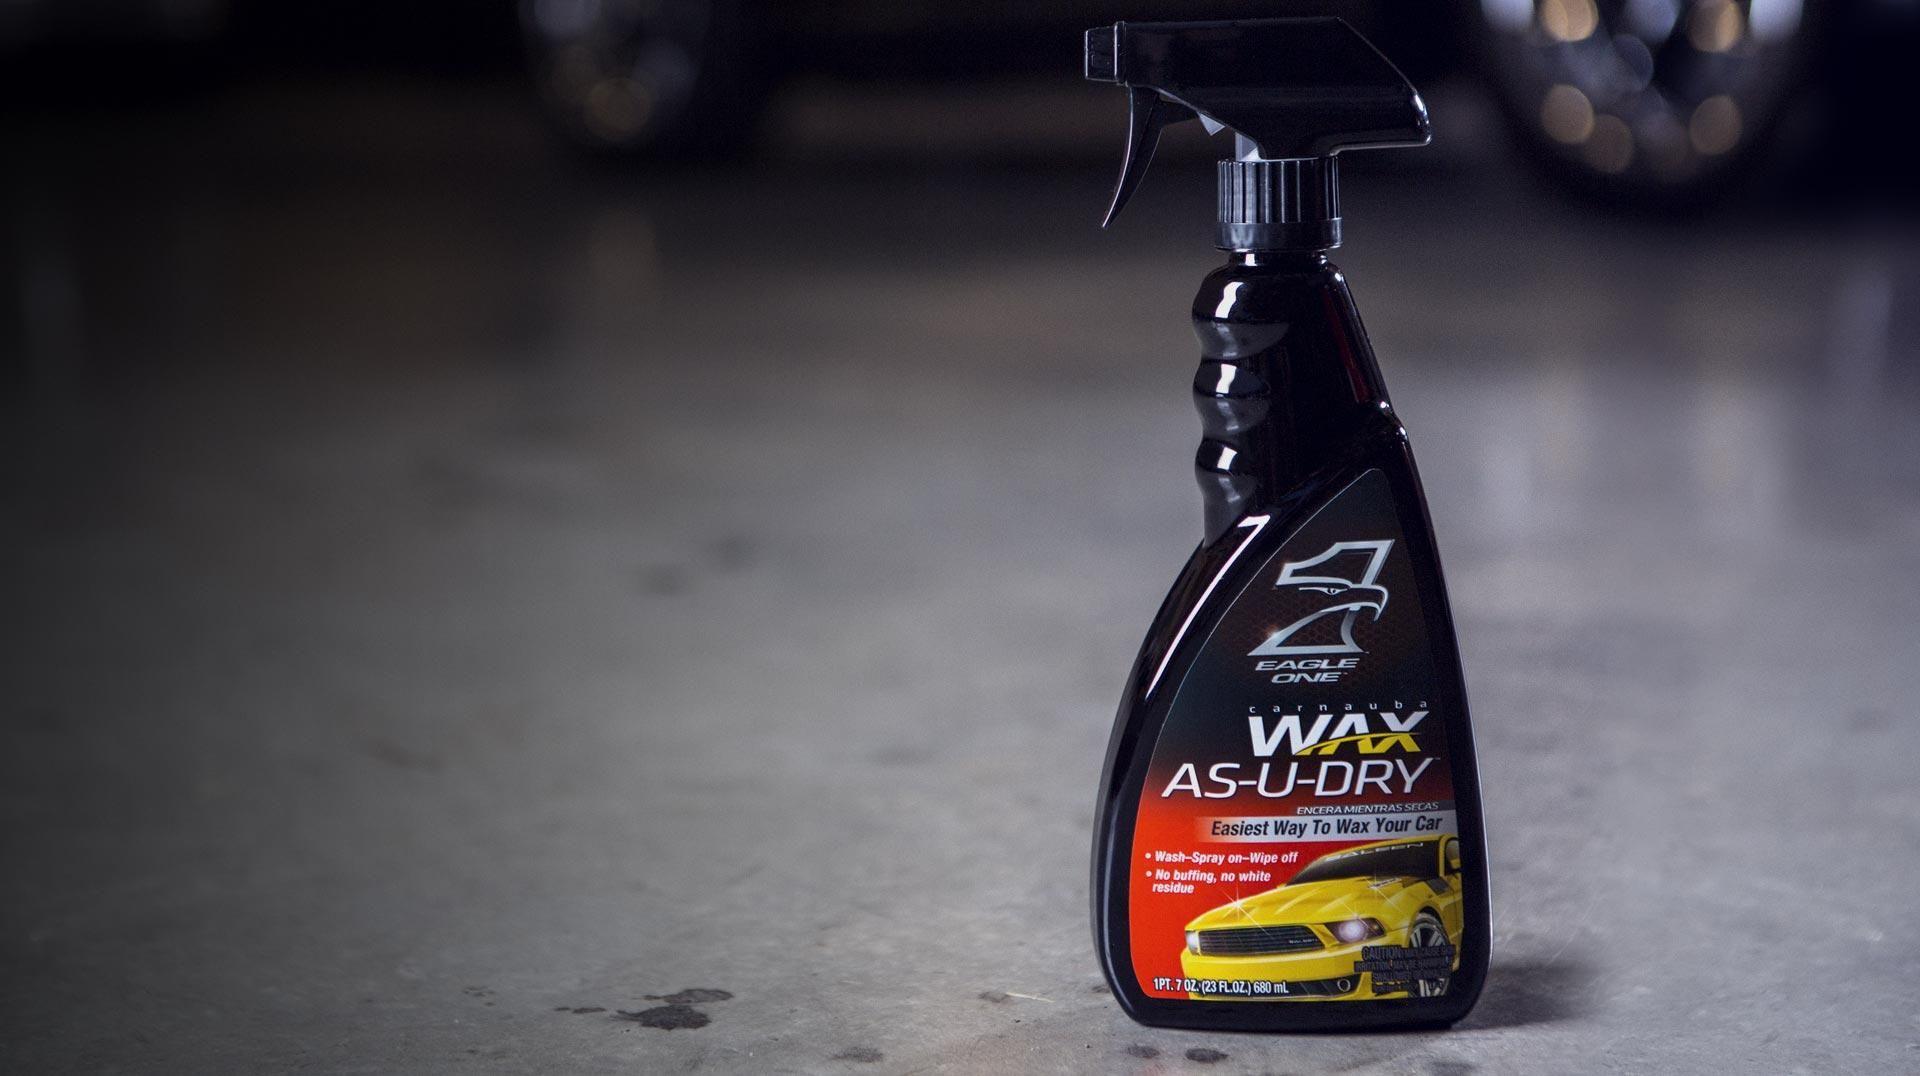 Eagle One SuperStarCarWash Goodyear Arizona Wax clean